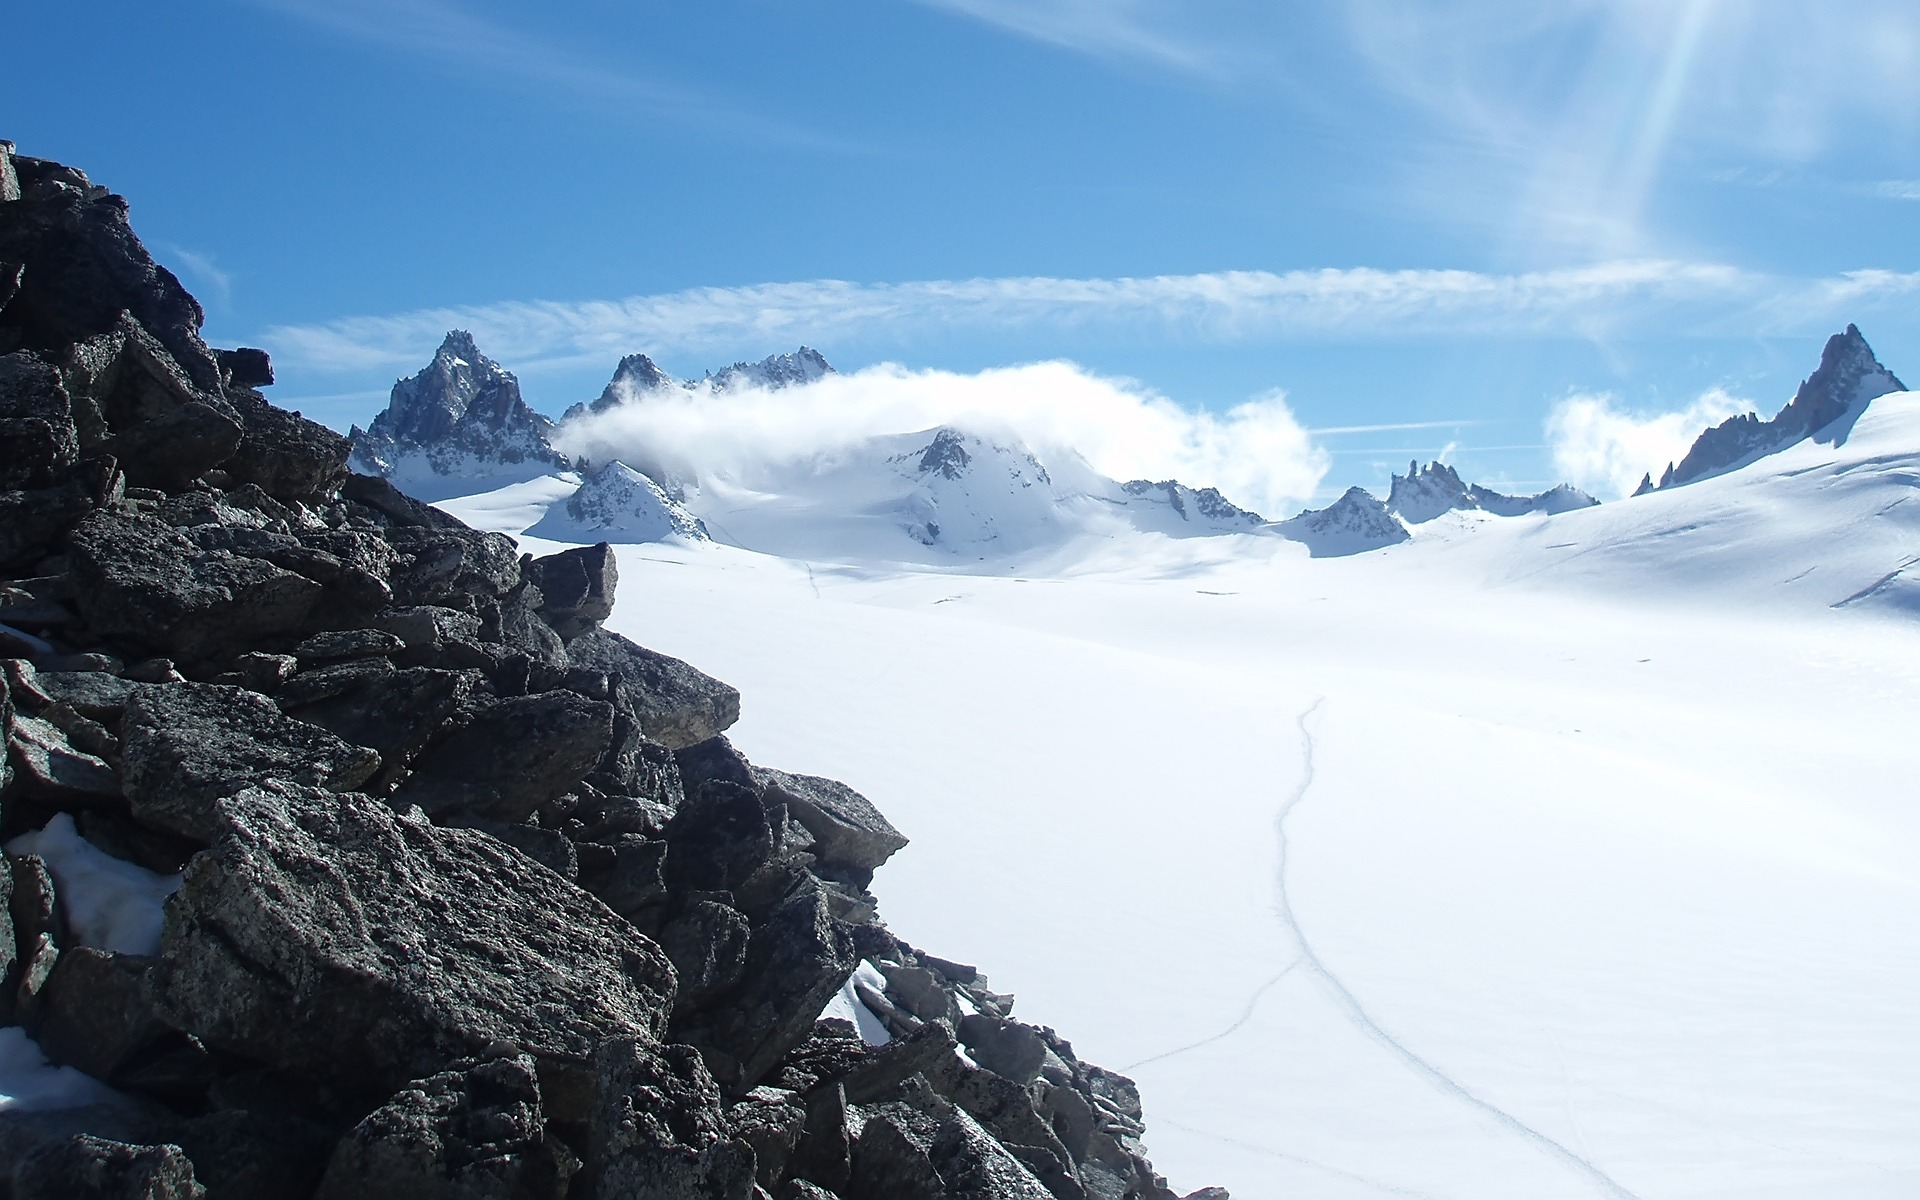 горы камни снег зима  № 2512885 бесплатно